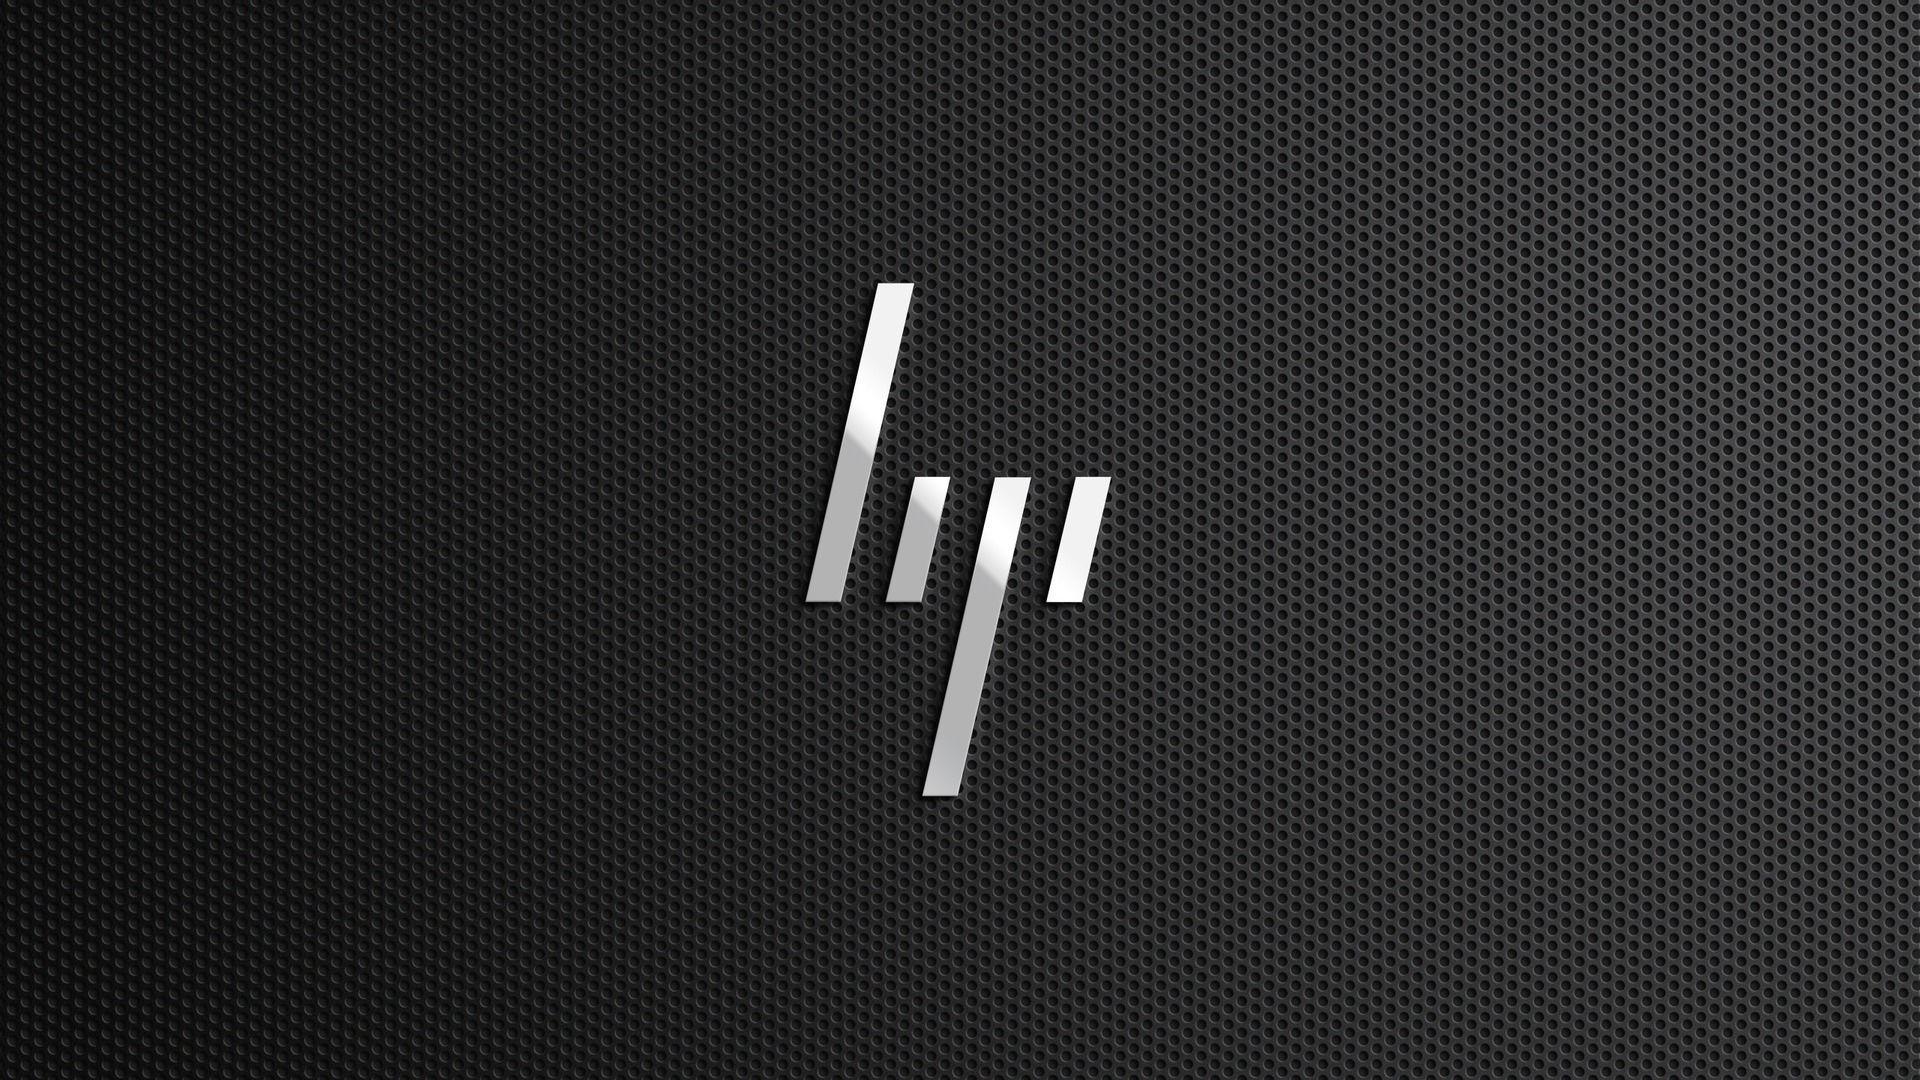 hp laptop backgrounds, hp enterprise wallpaper